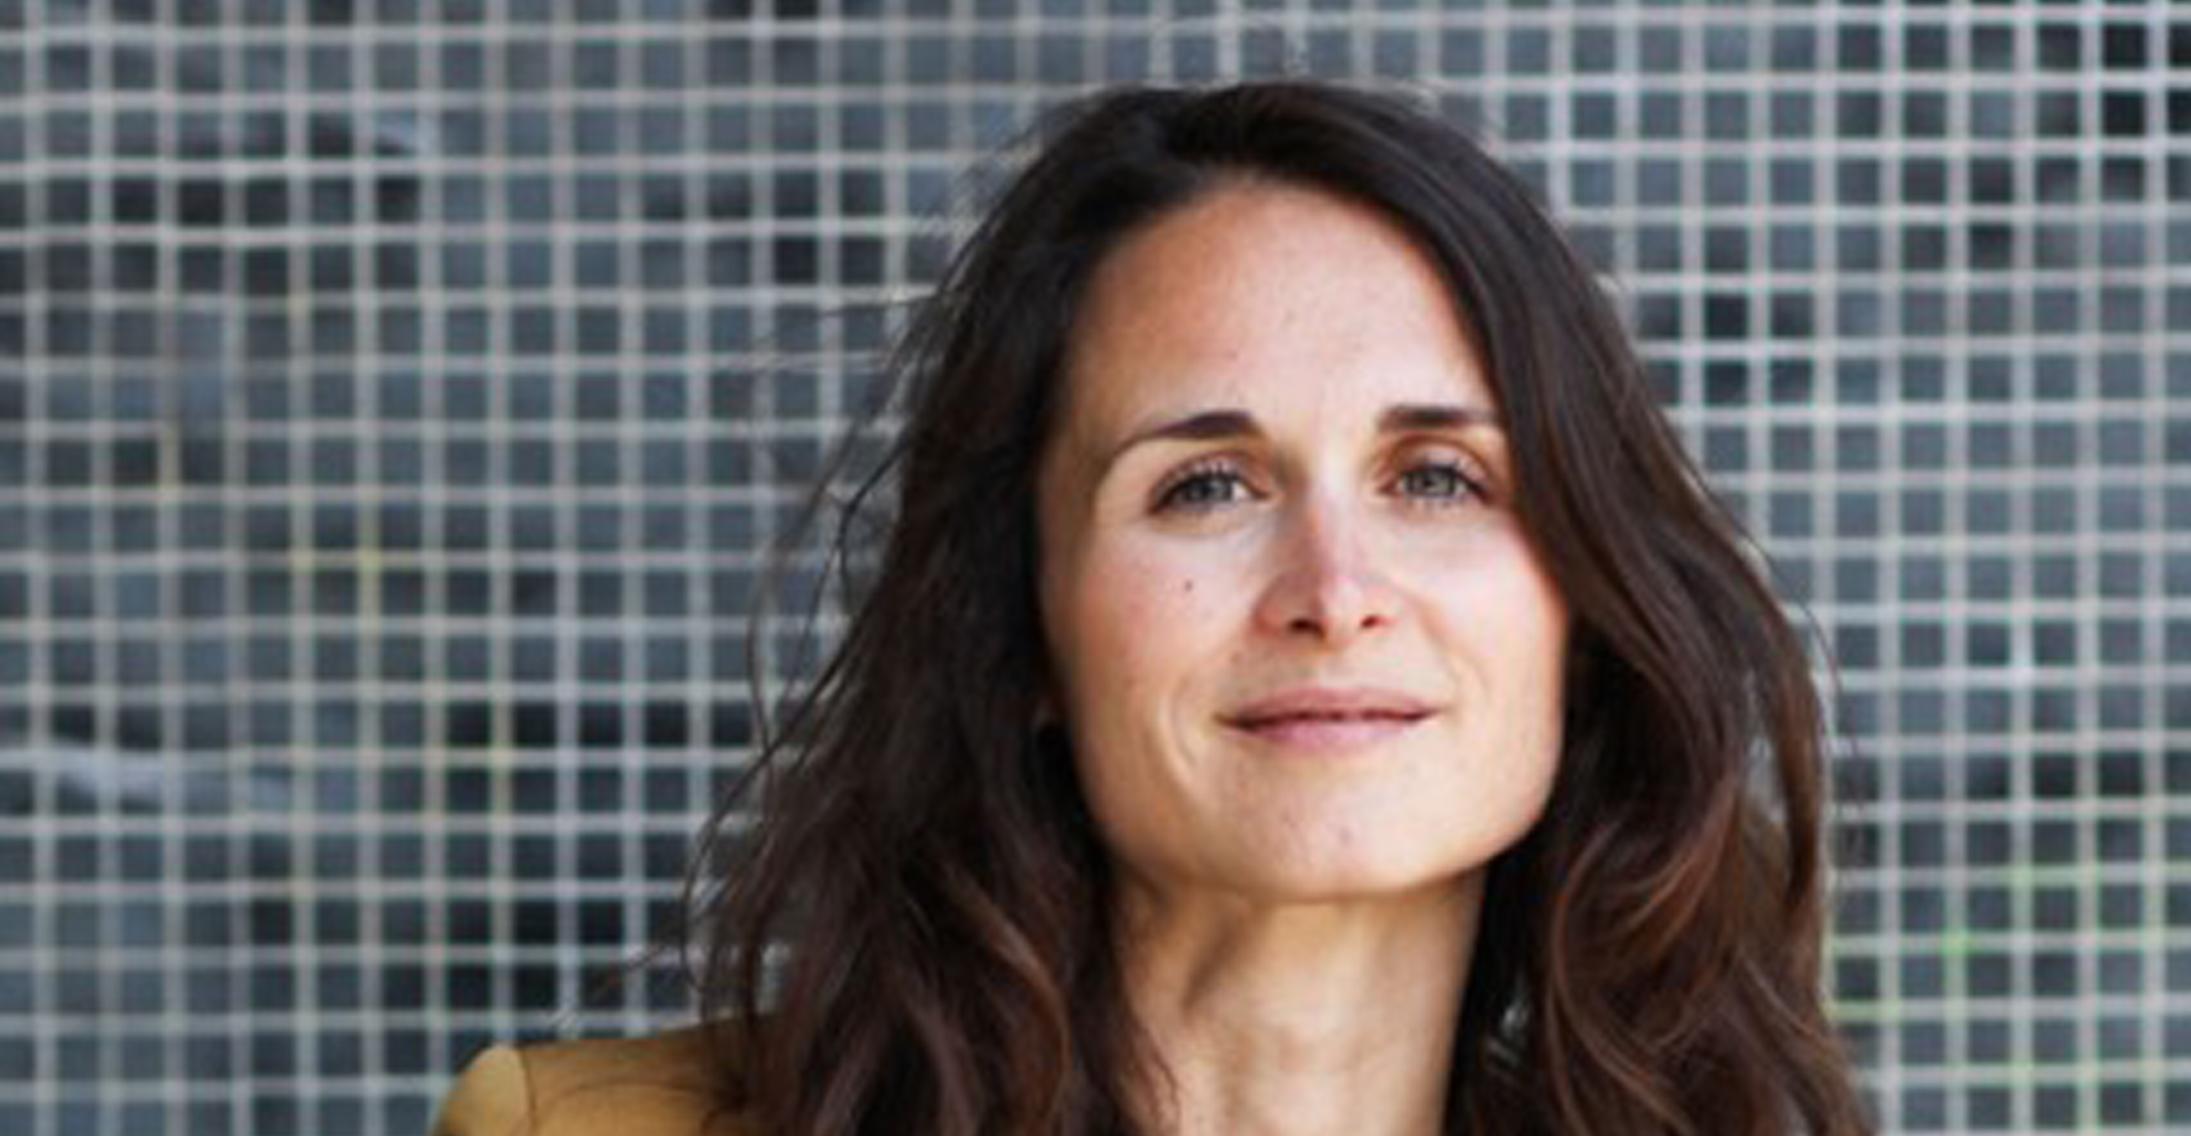 Constance Gennari, The Socialite Family